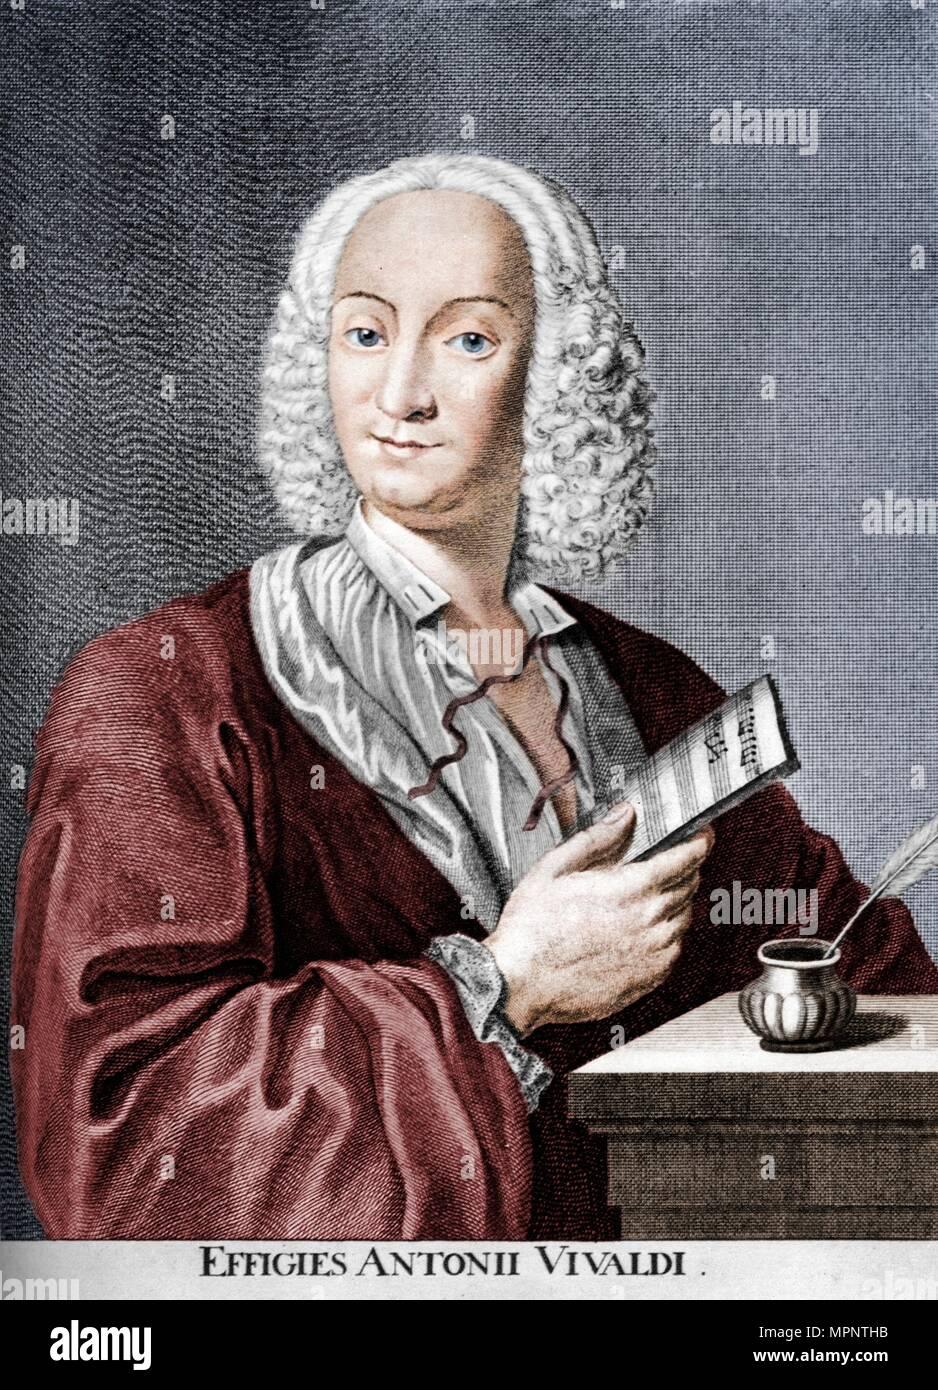 Antonio Vivaldi, Italian Baroque composer, Catholic priest, and virtuoso violinist, 1725. Artist: Peter La Cave. - Stock Image